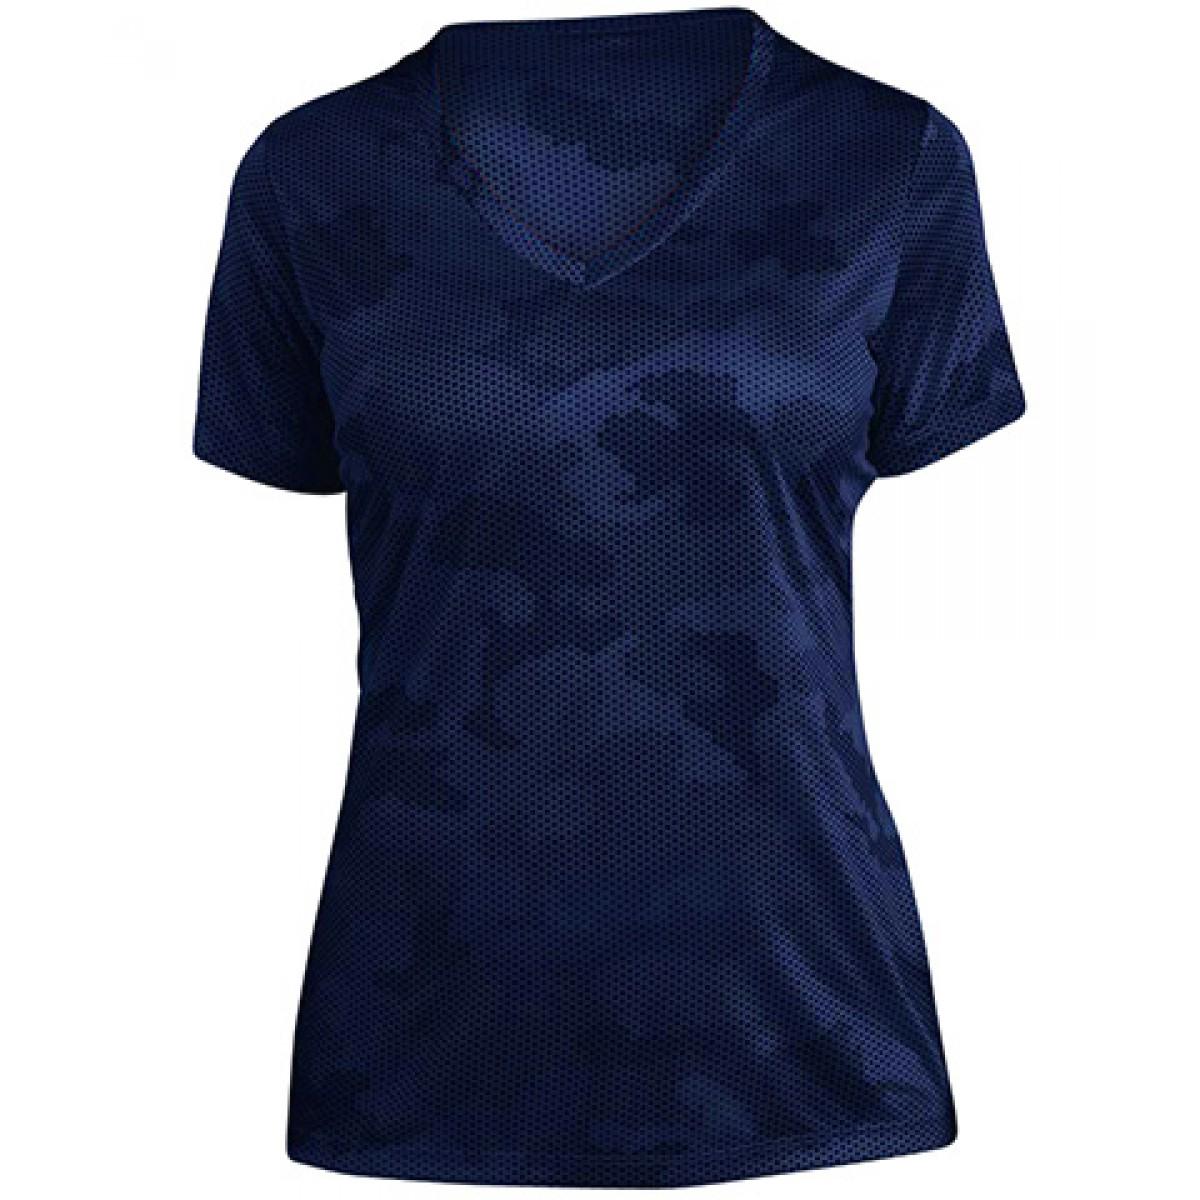 Ladies CamoHex V-Neck Tee-Royal Blue-2XL